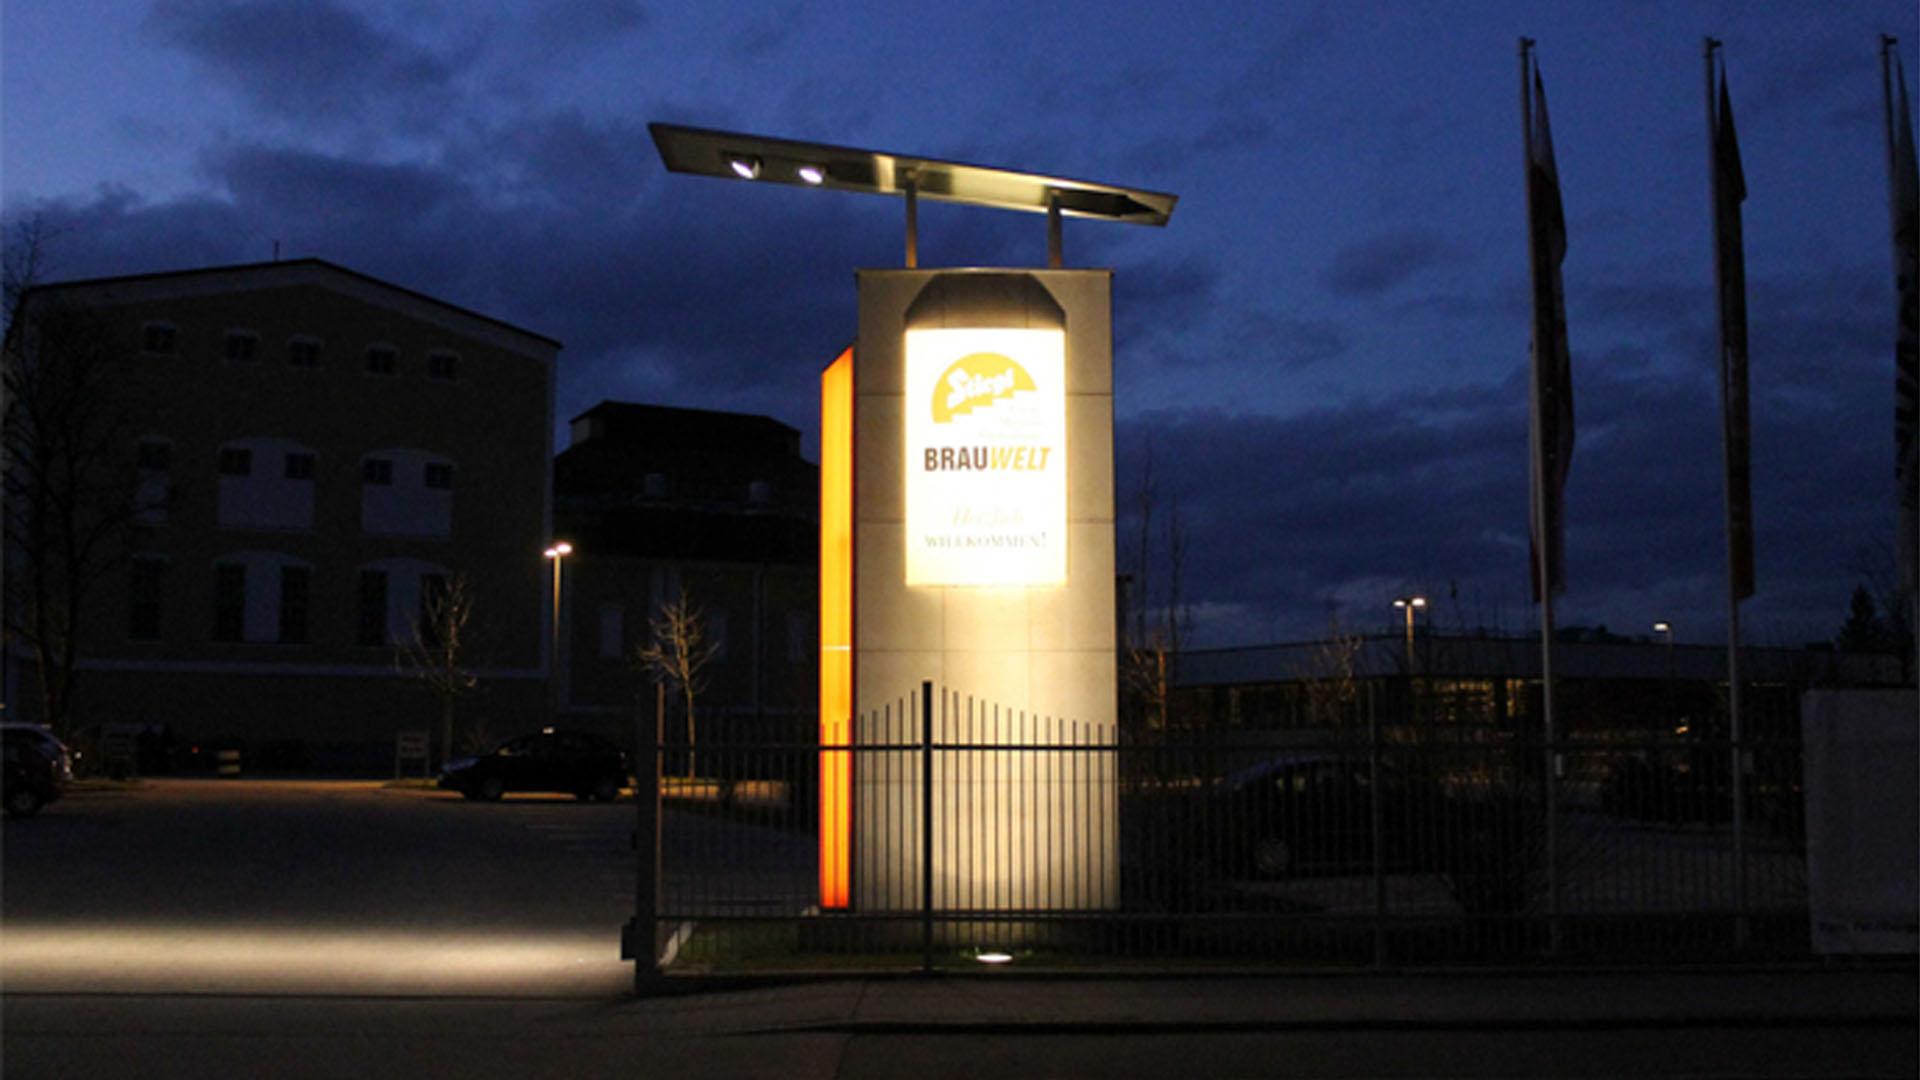 Stiegl-Brauwelt-Parkplatz-Objekt_02